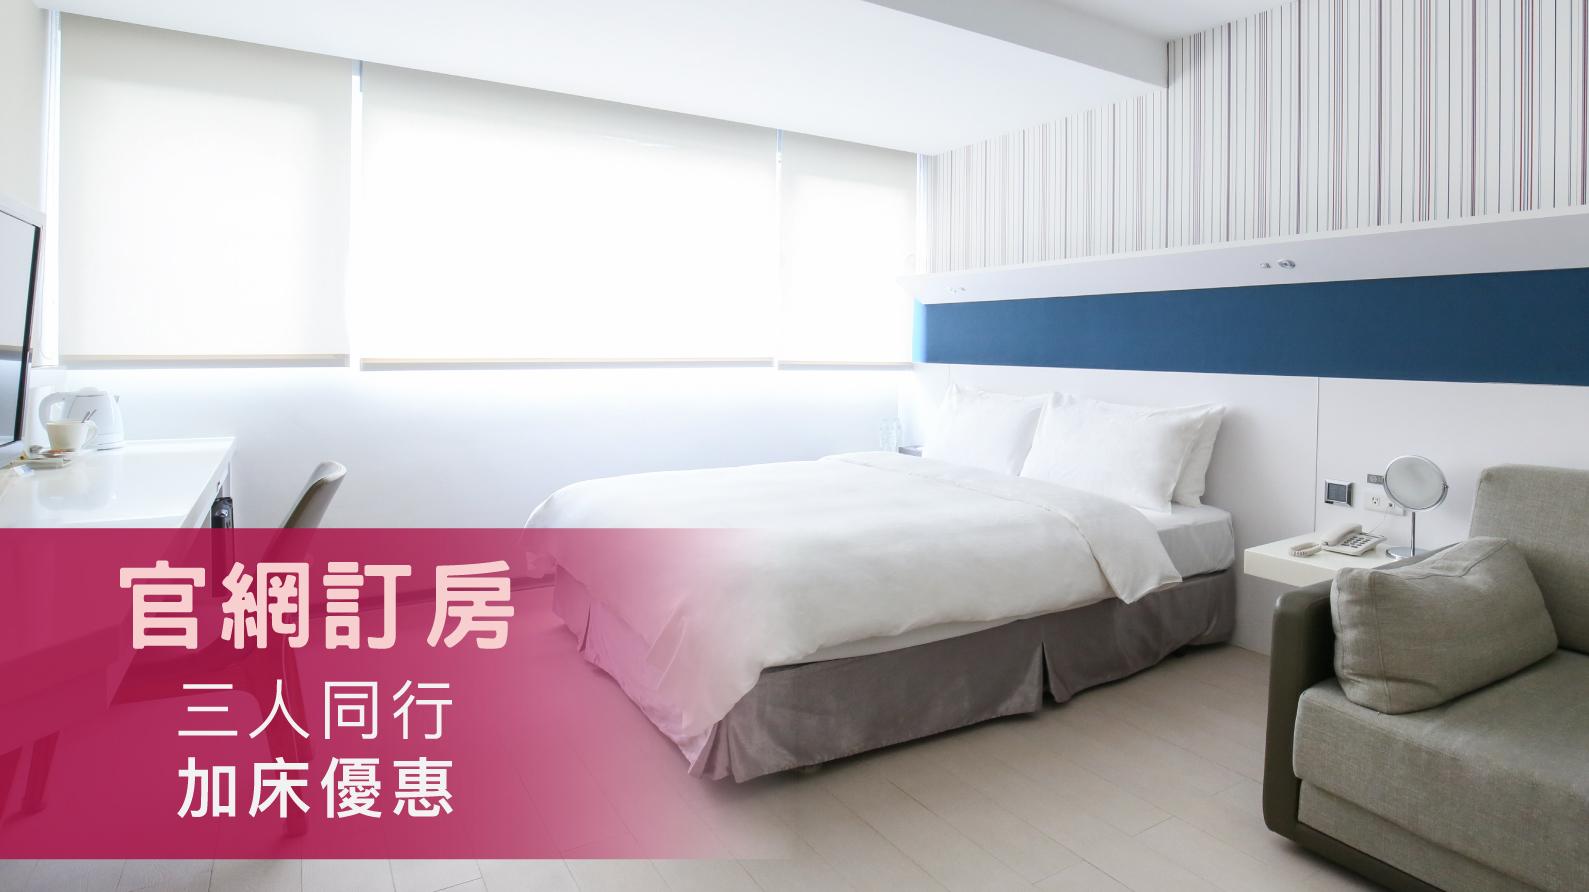 https://booking.taipeiinngroup.com/nv/images/suite/525_109thumb.jpg